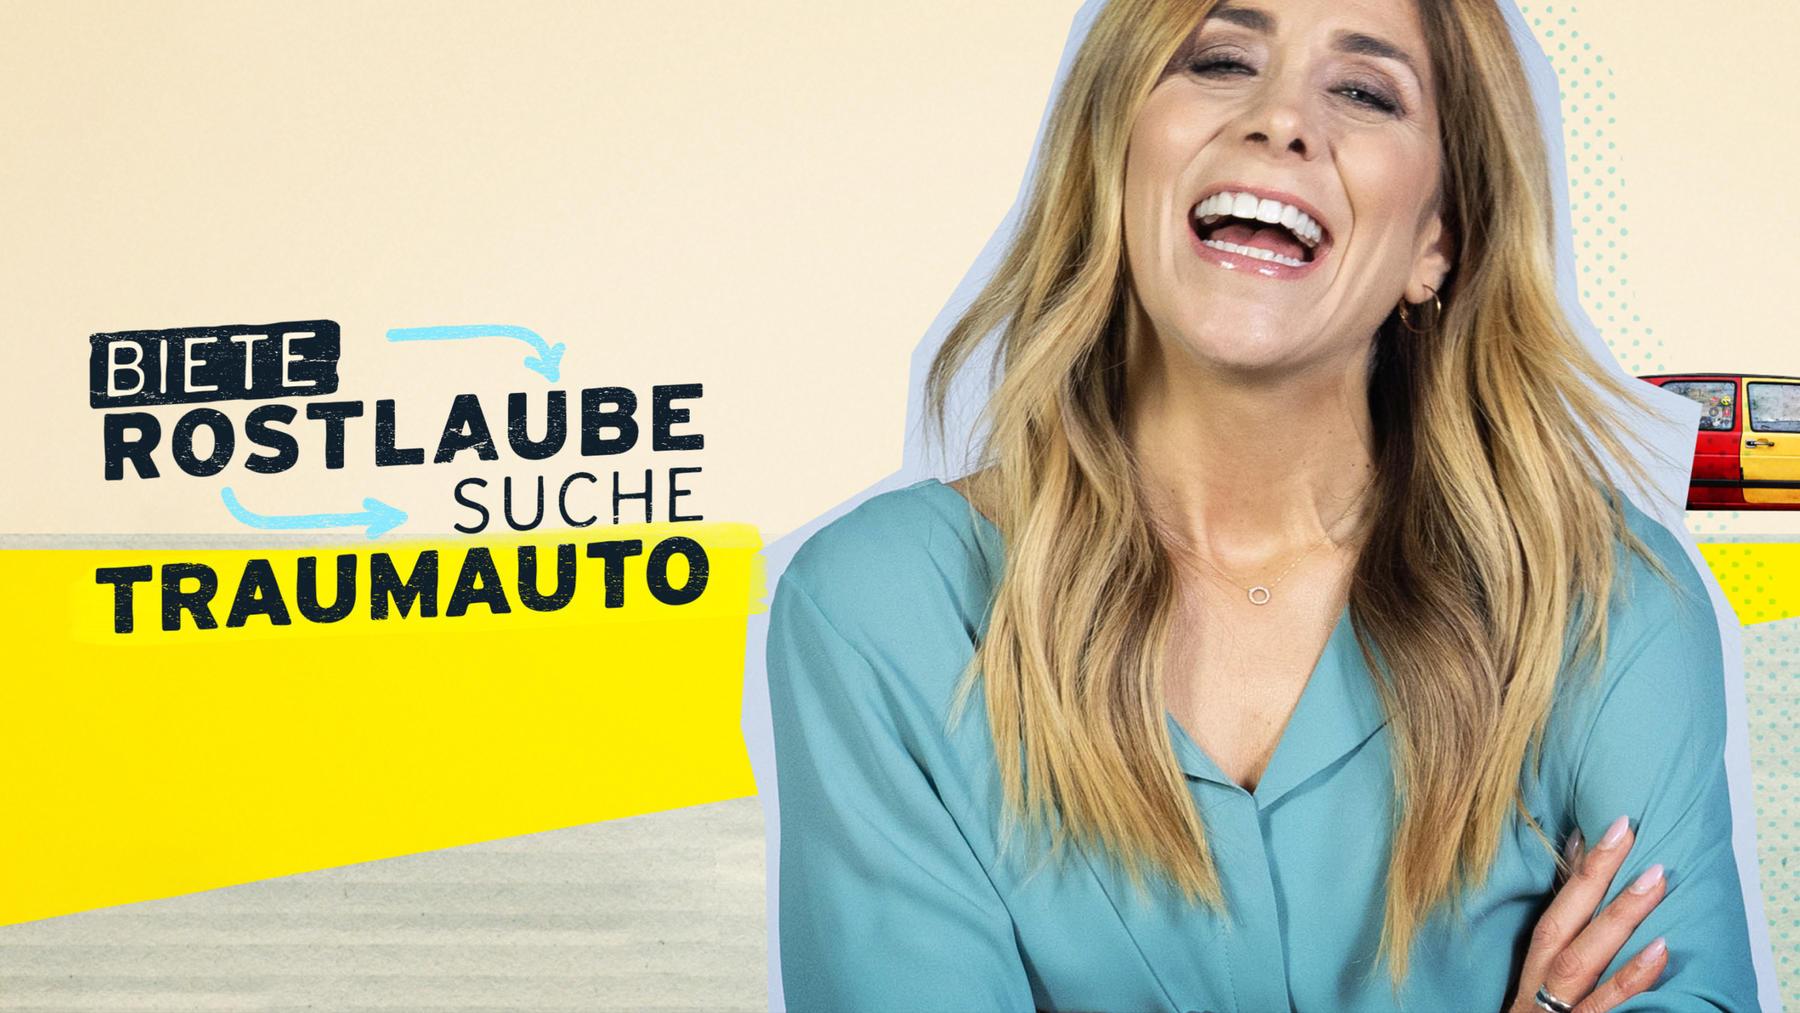 Biete Rostlaube, suche Traumauto